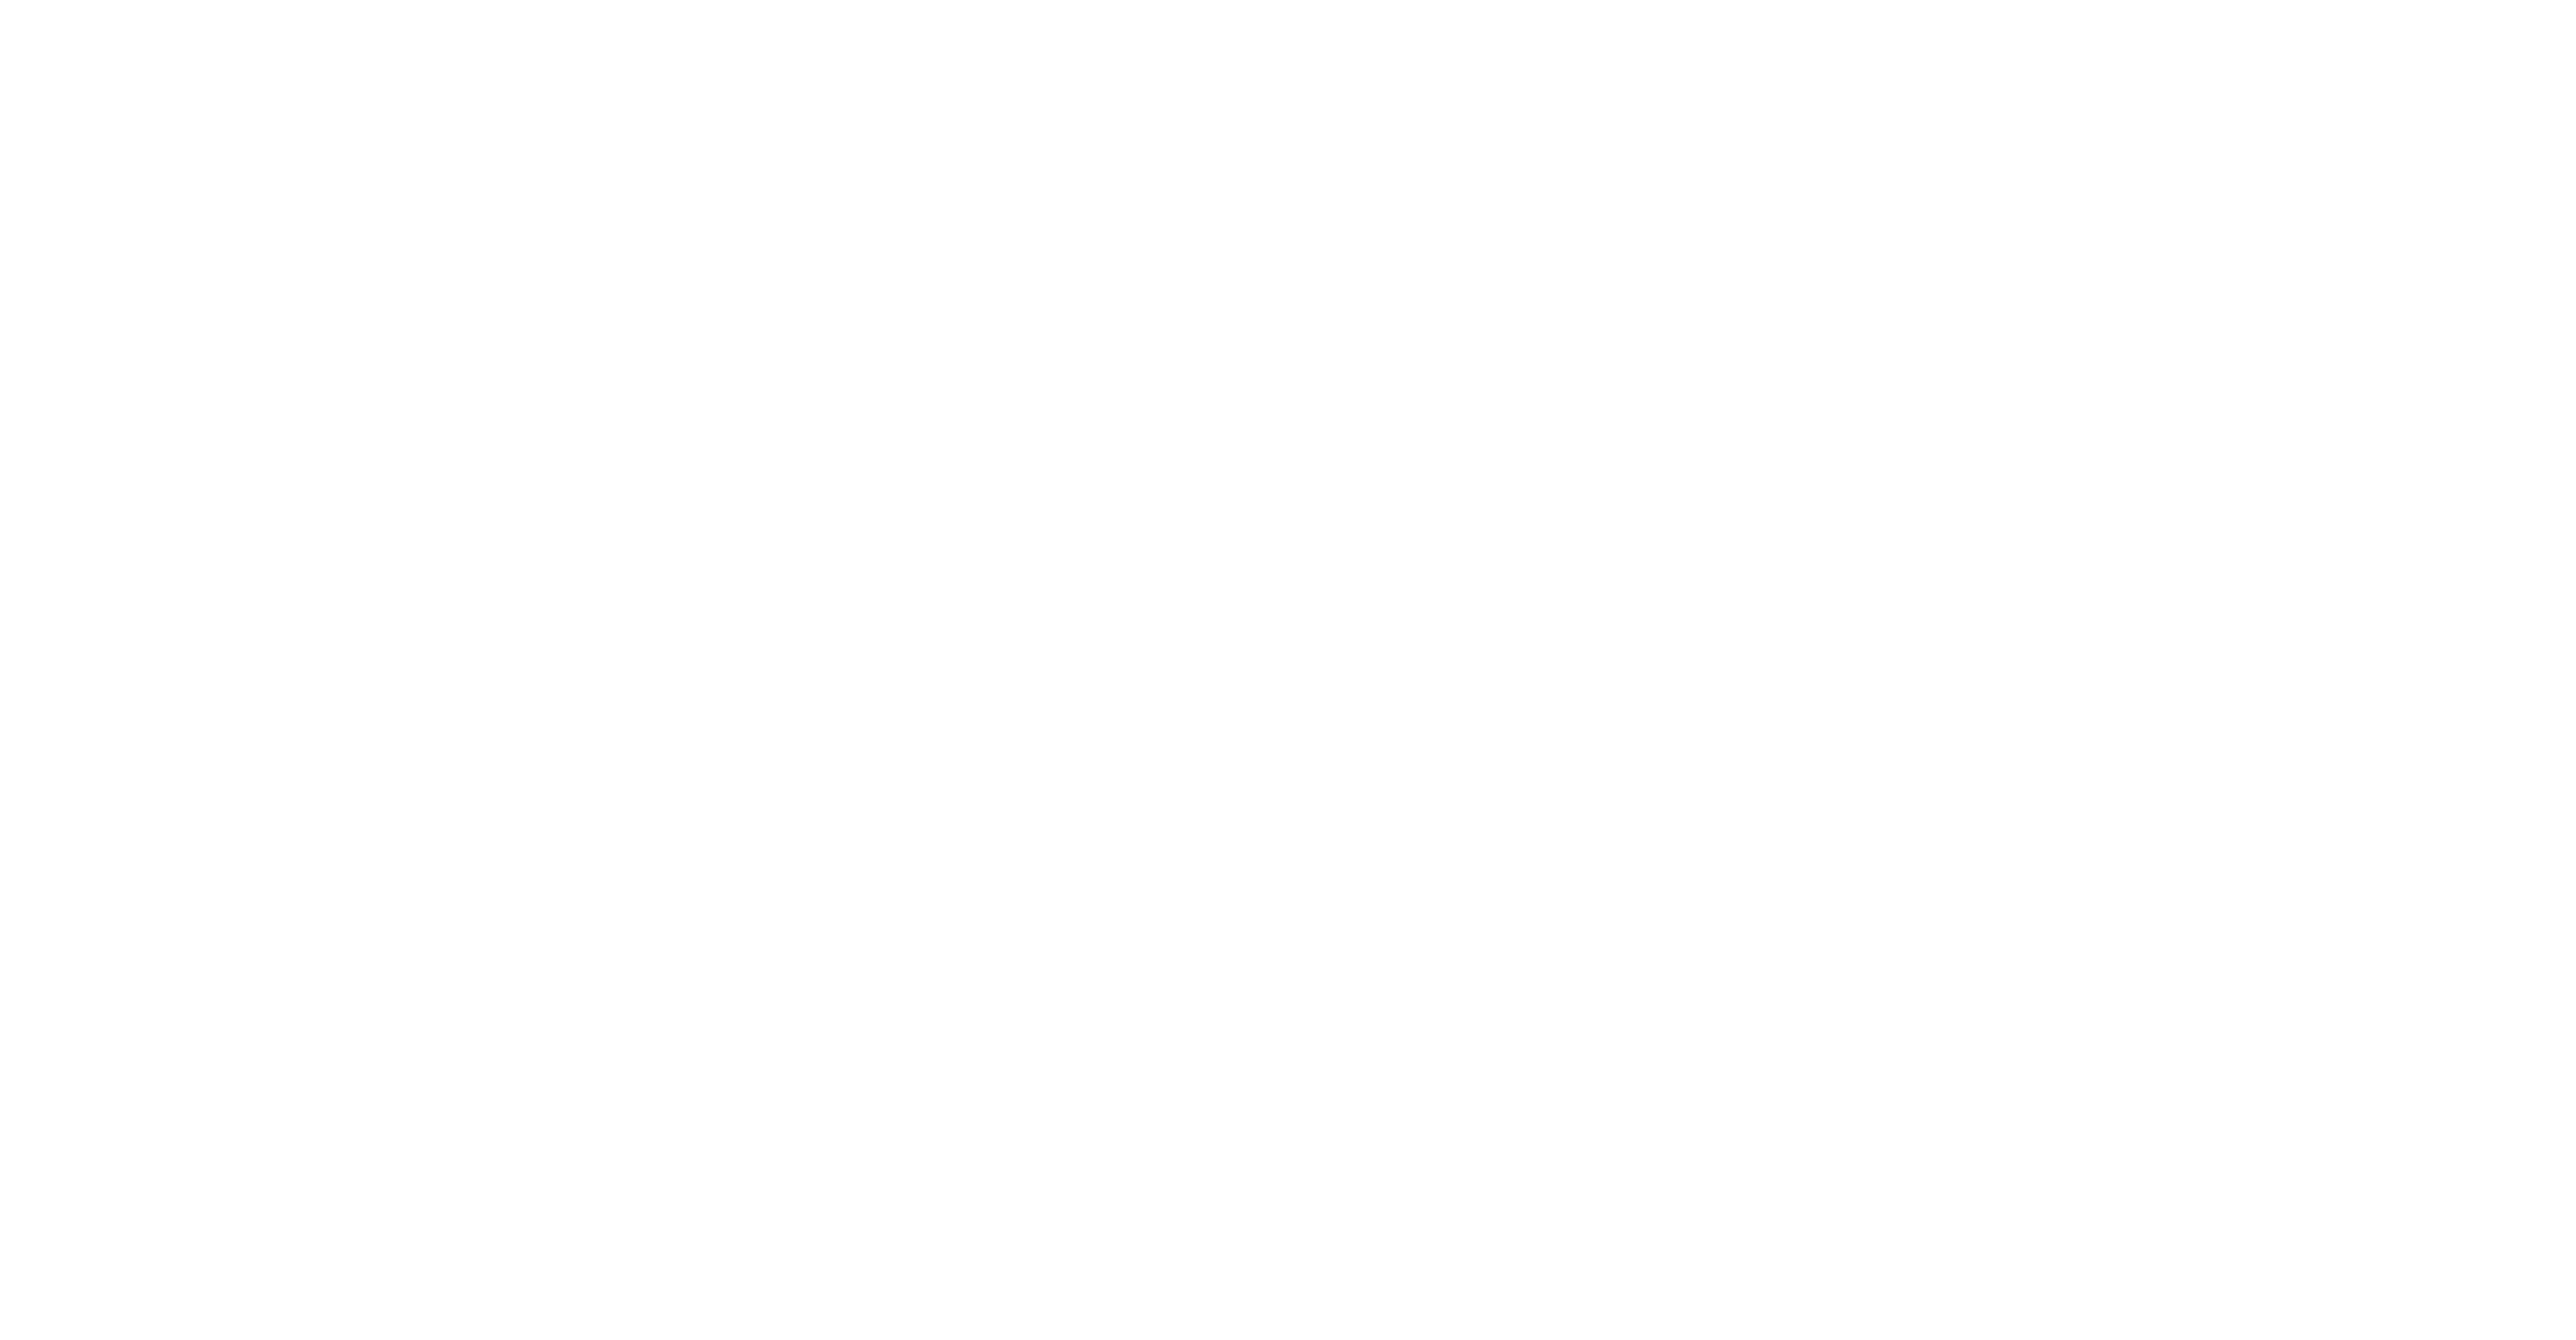 impalabeats2-txt